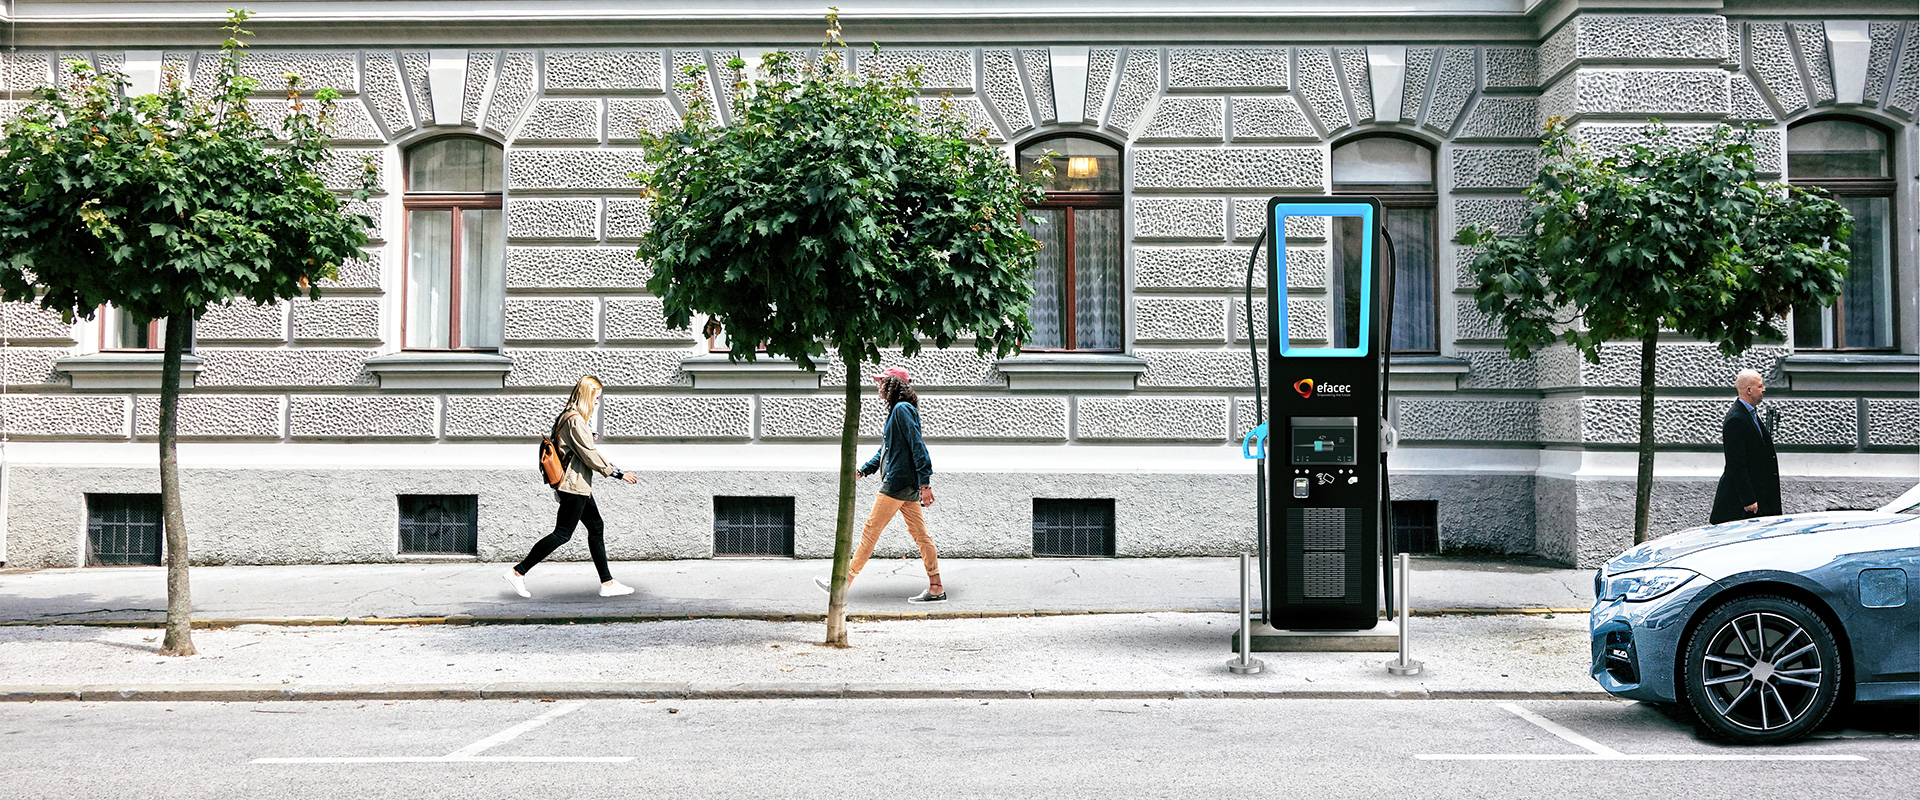 electricmobility.efacec.com